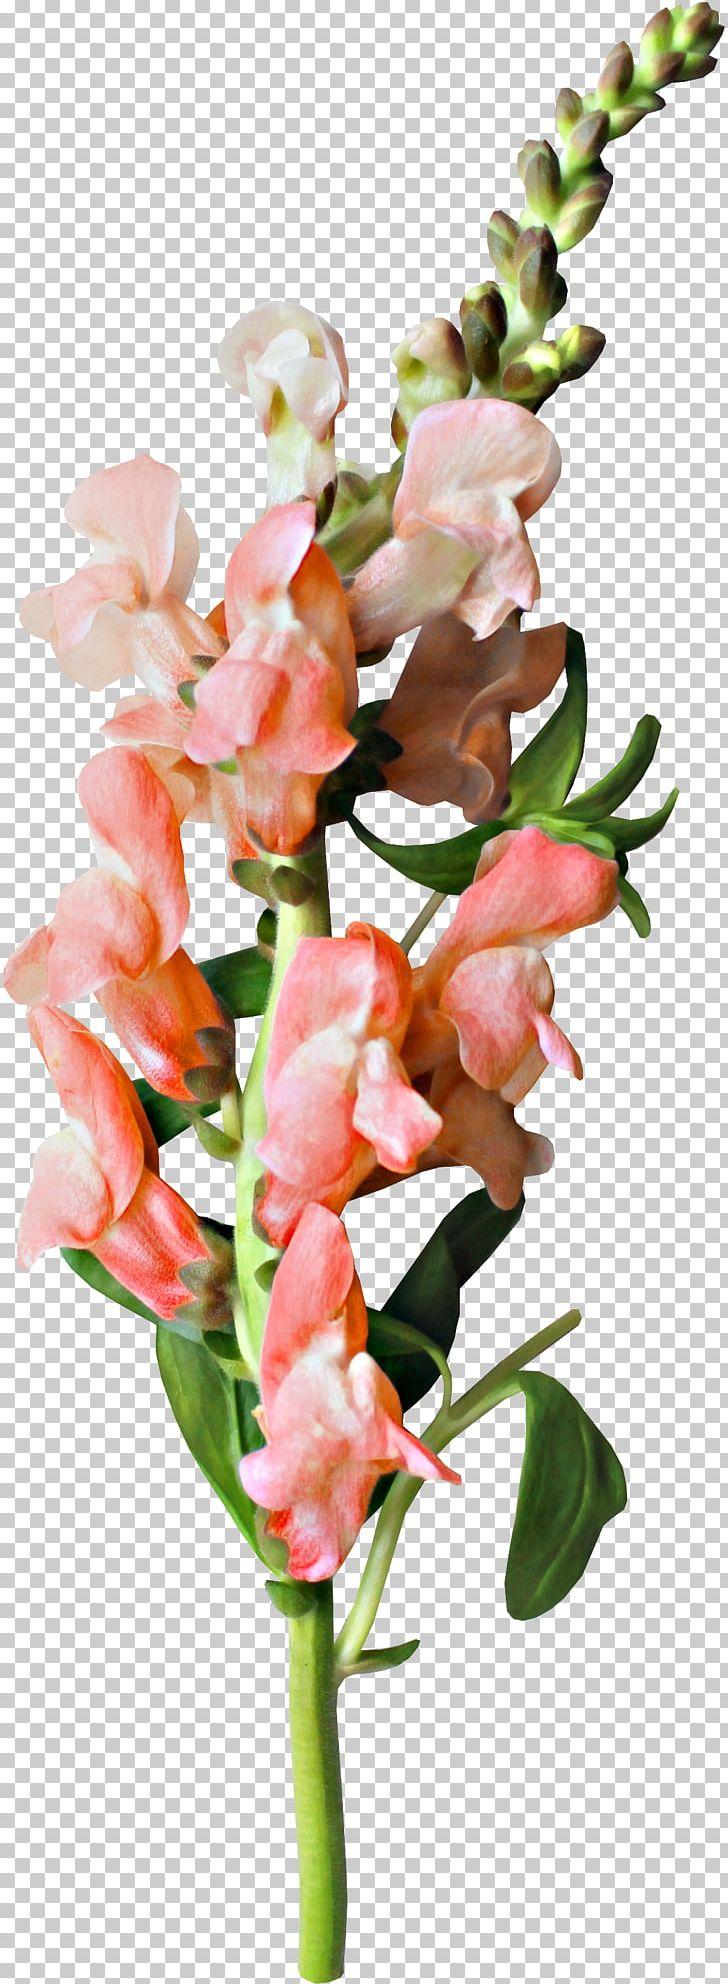 Flower PNG, Clipart, Artificial Flower, Bouquet, Cut Flowers, Floristry, Flower Arranging Free PNG Download